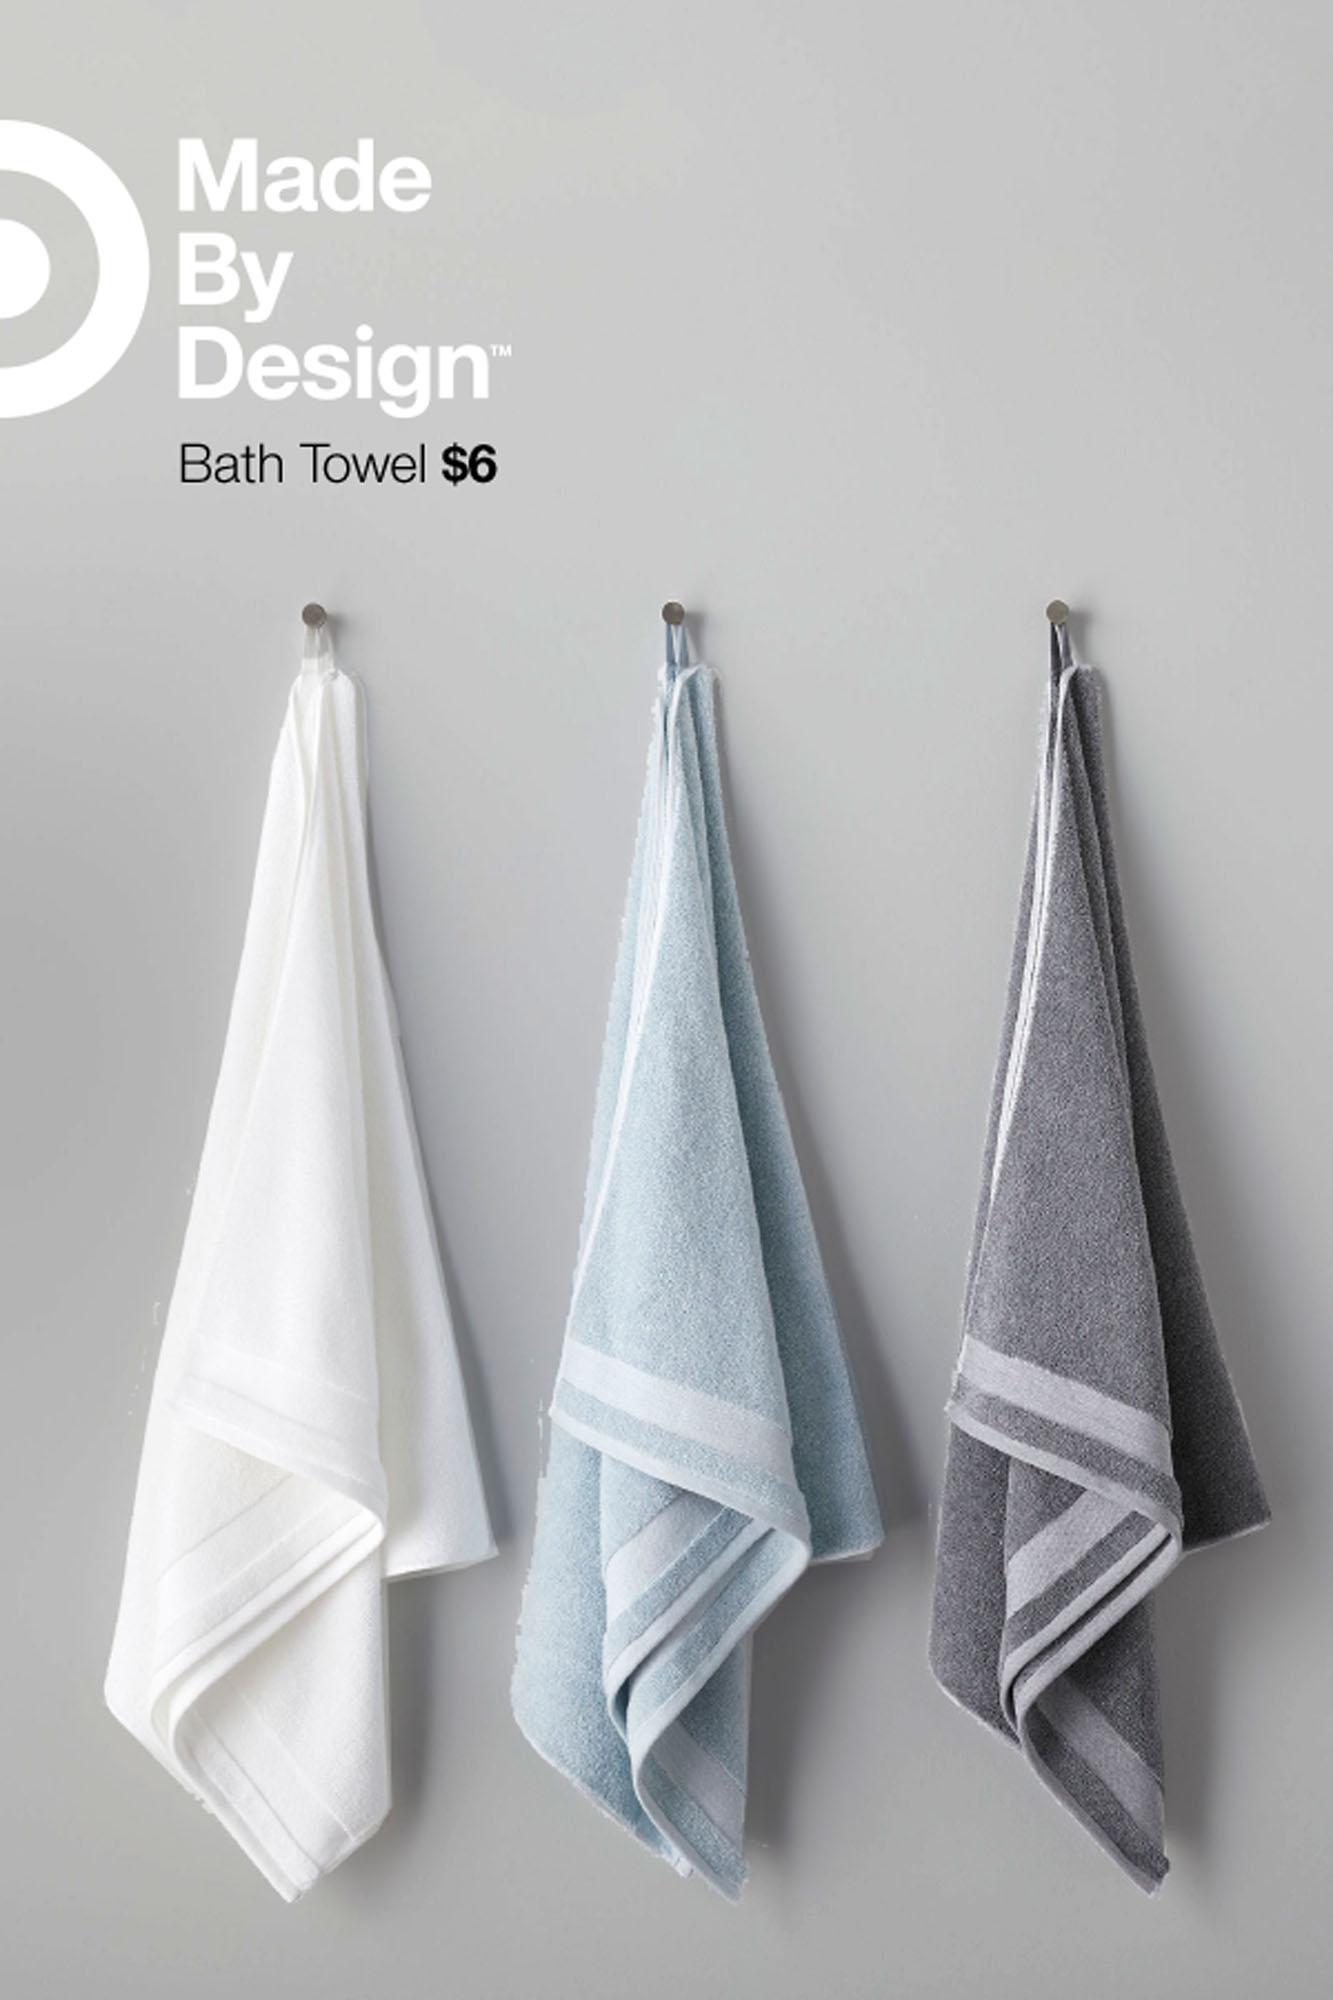 MBD_Pinterest_Towels_600x900_V3.jpg